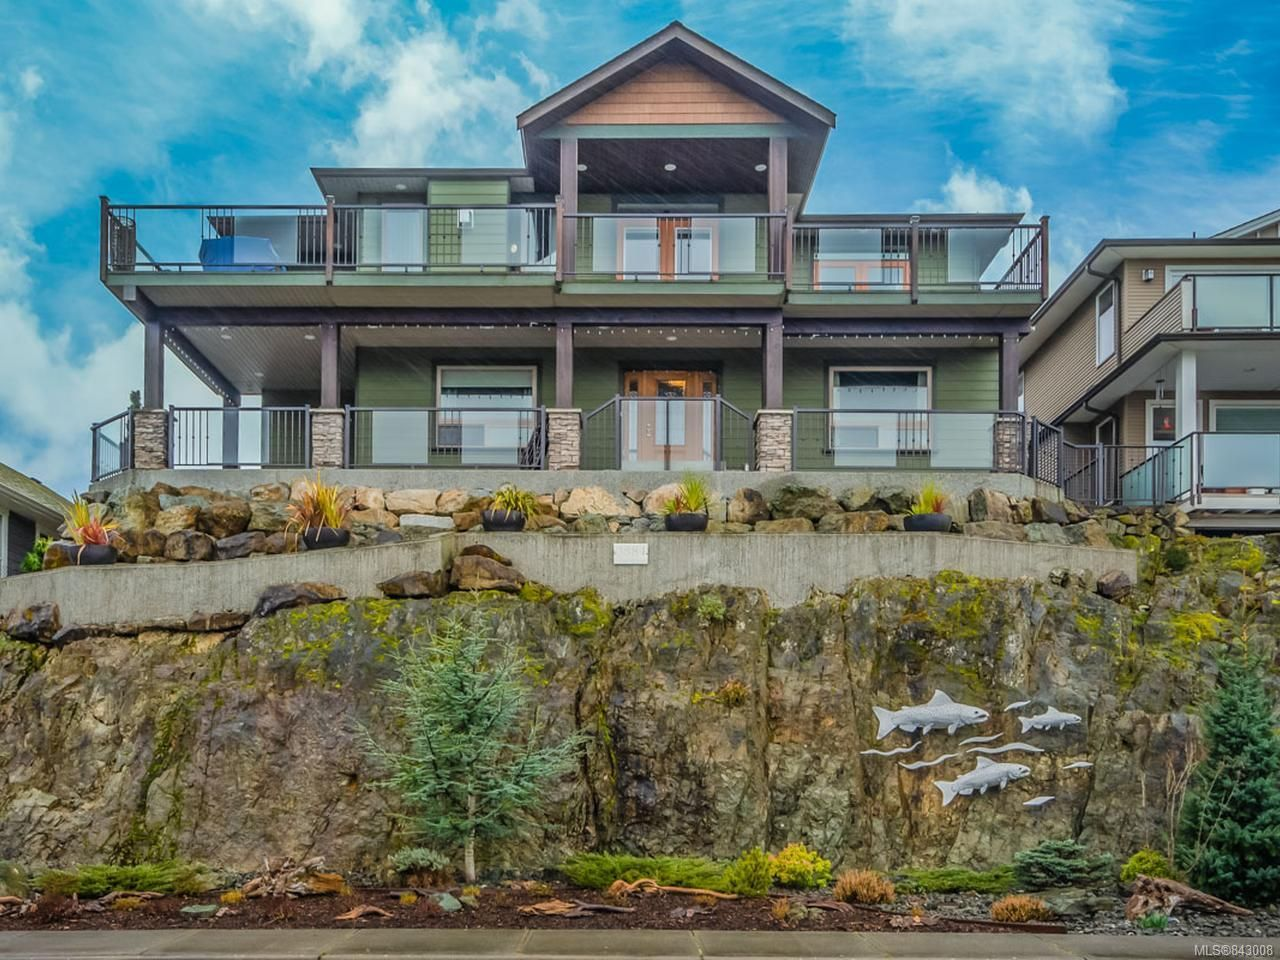 Main Photo: 3384 Greyhawk Dr in NANAIMO: Na Hammond Bay House for sale (Nanaimo)  : MLS®# 843008